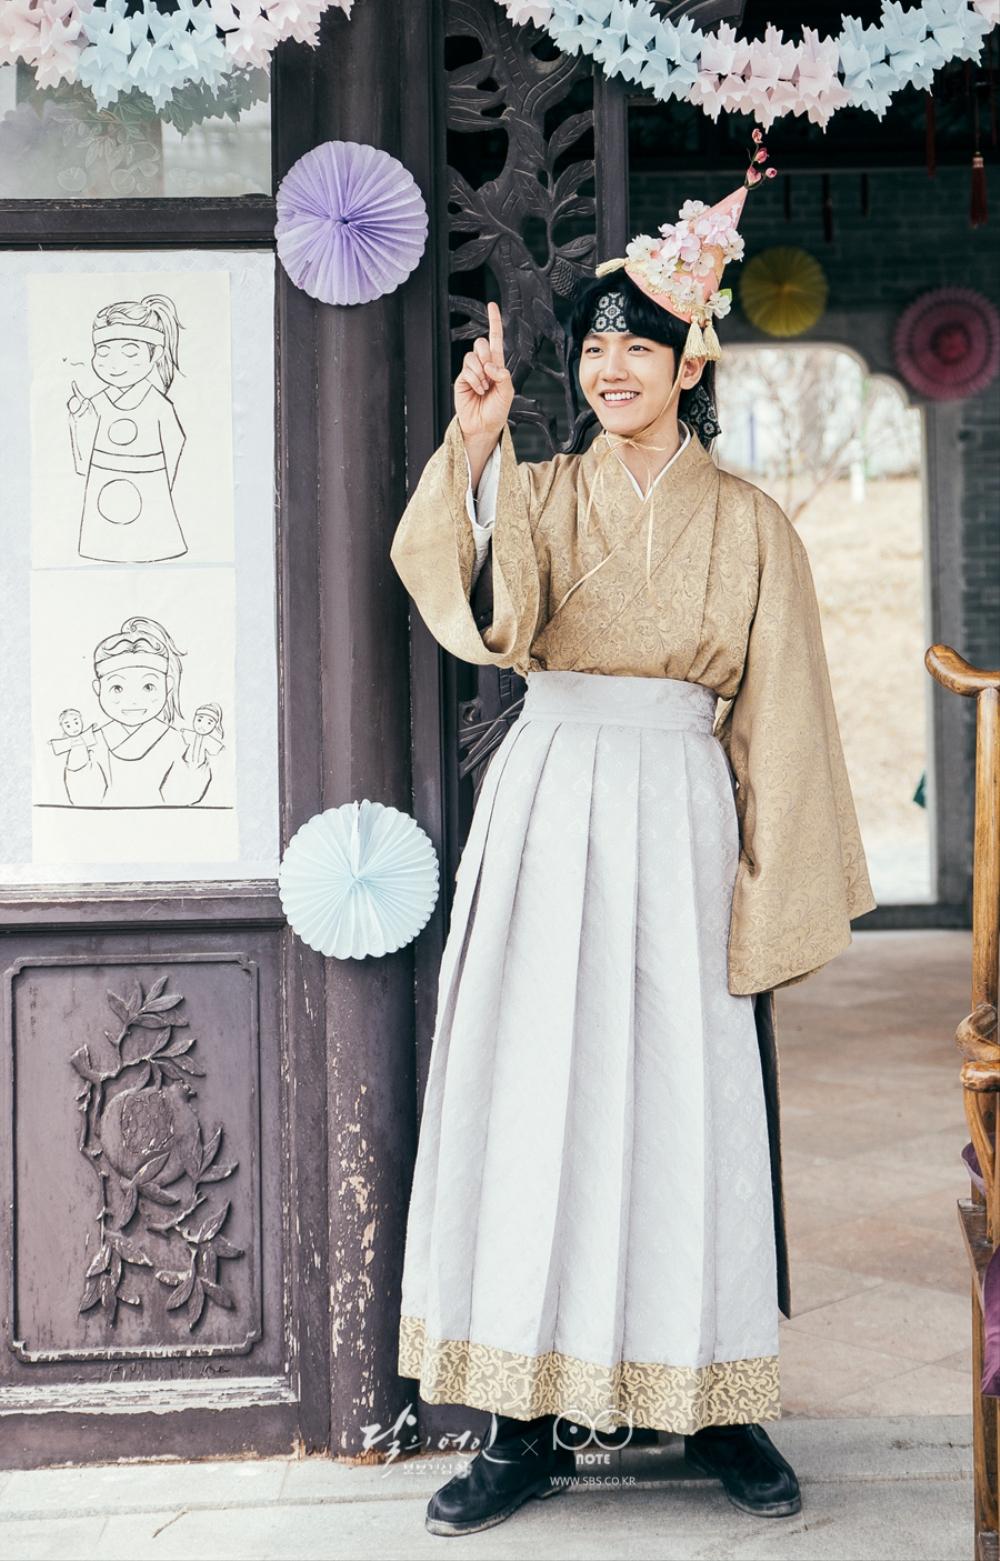 Byun Baekhyun Android Iphone Wallpaper 76805 Asiachan Kpop Image